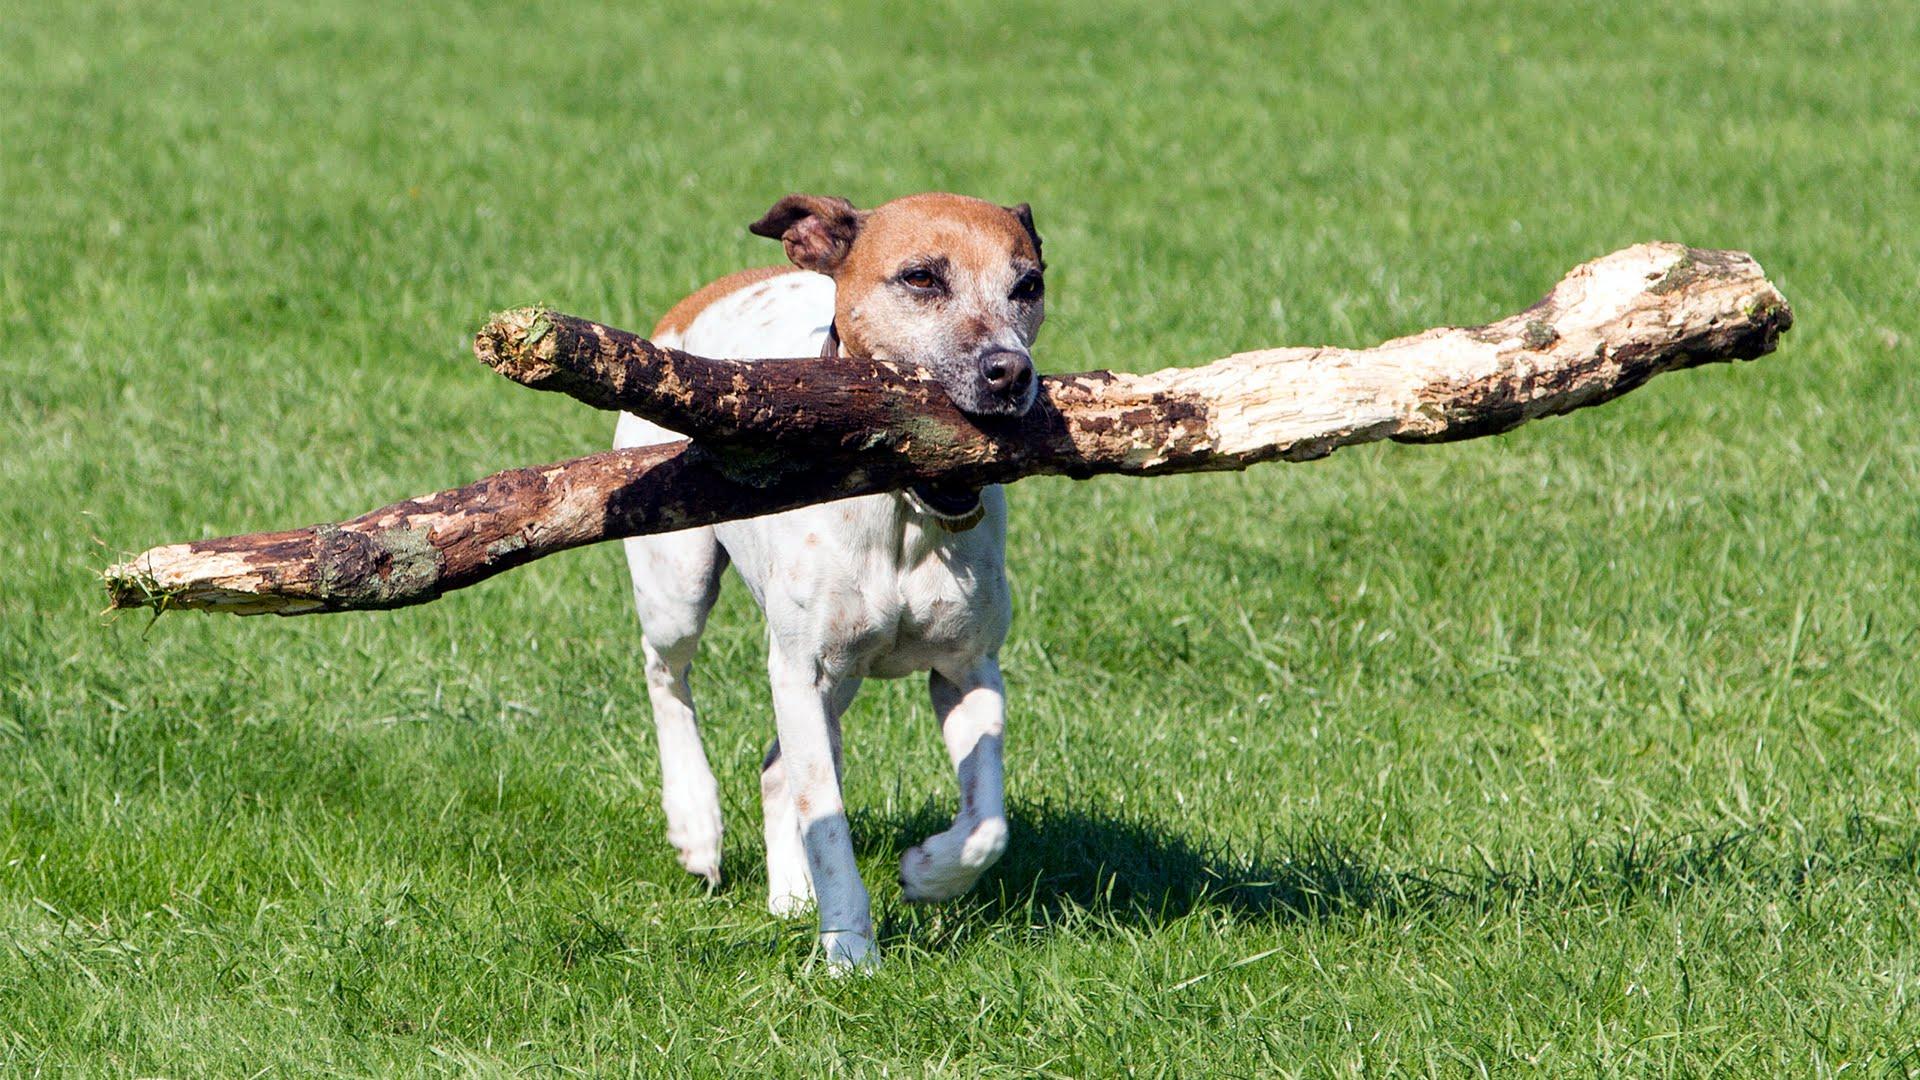 How Do I Train My Dog To Play Fetch